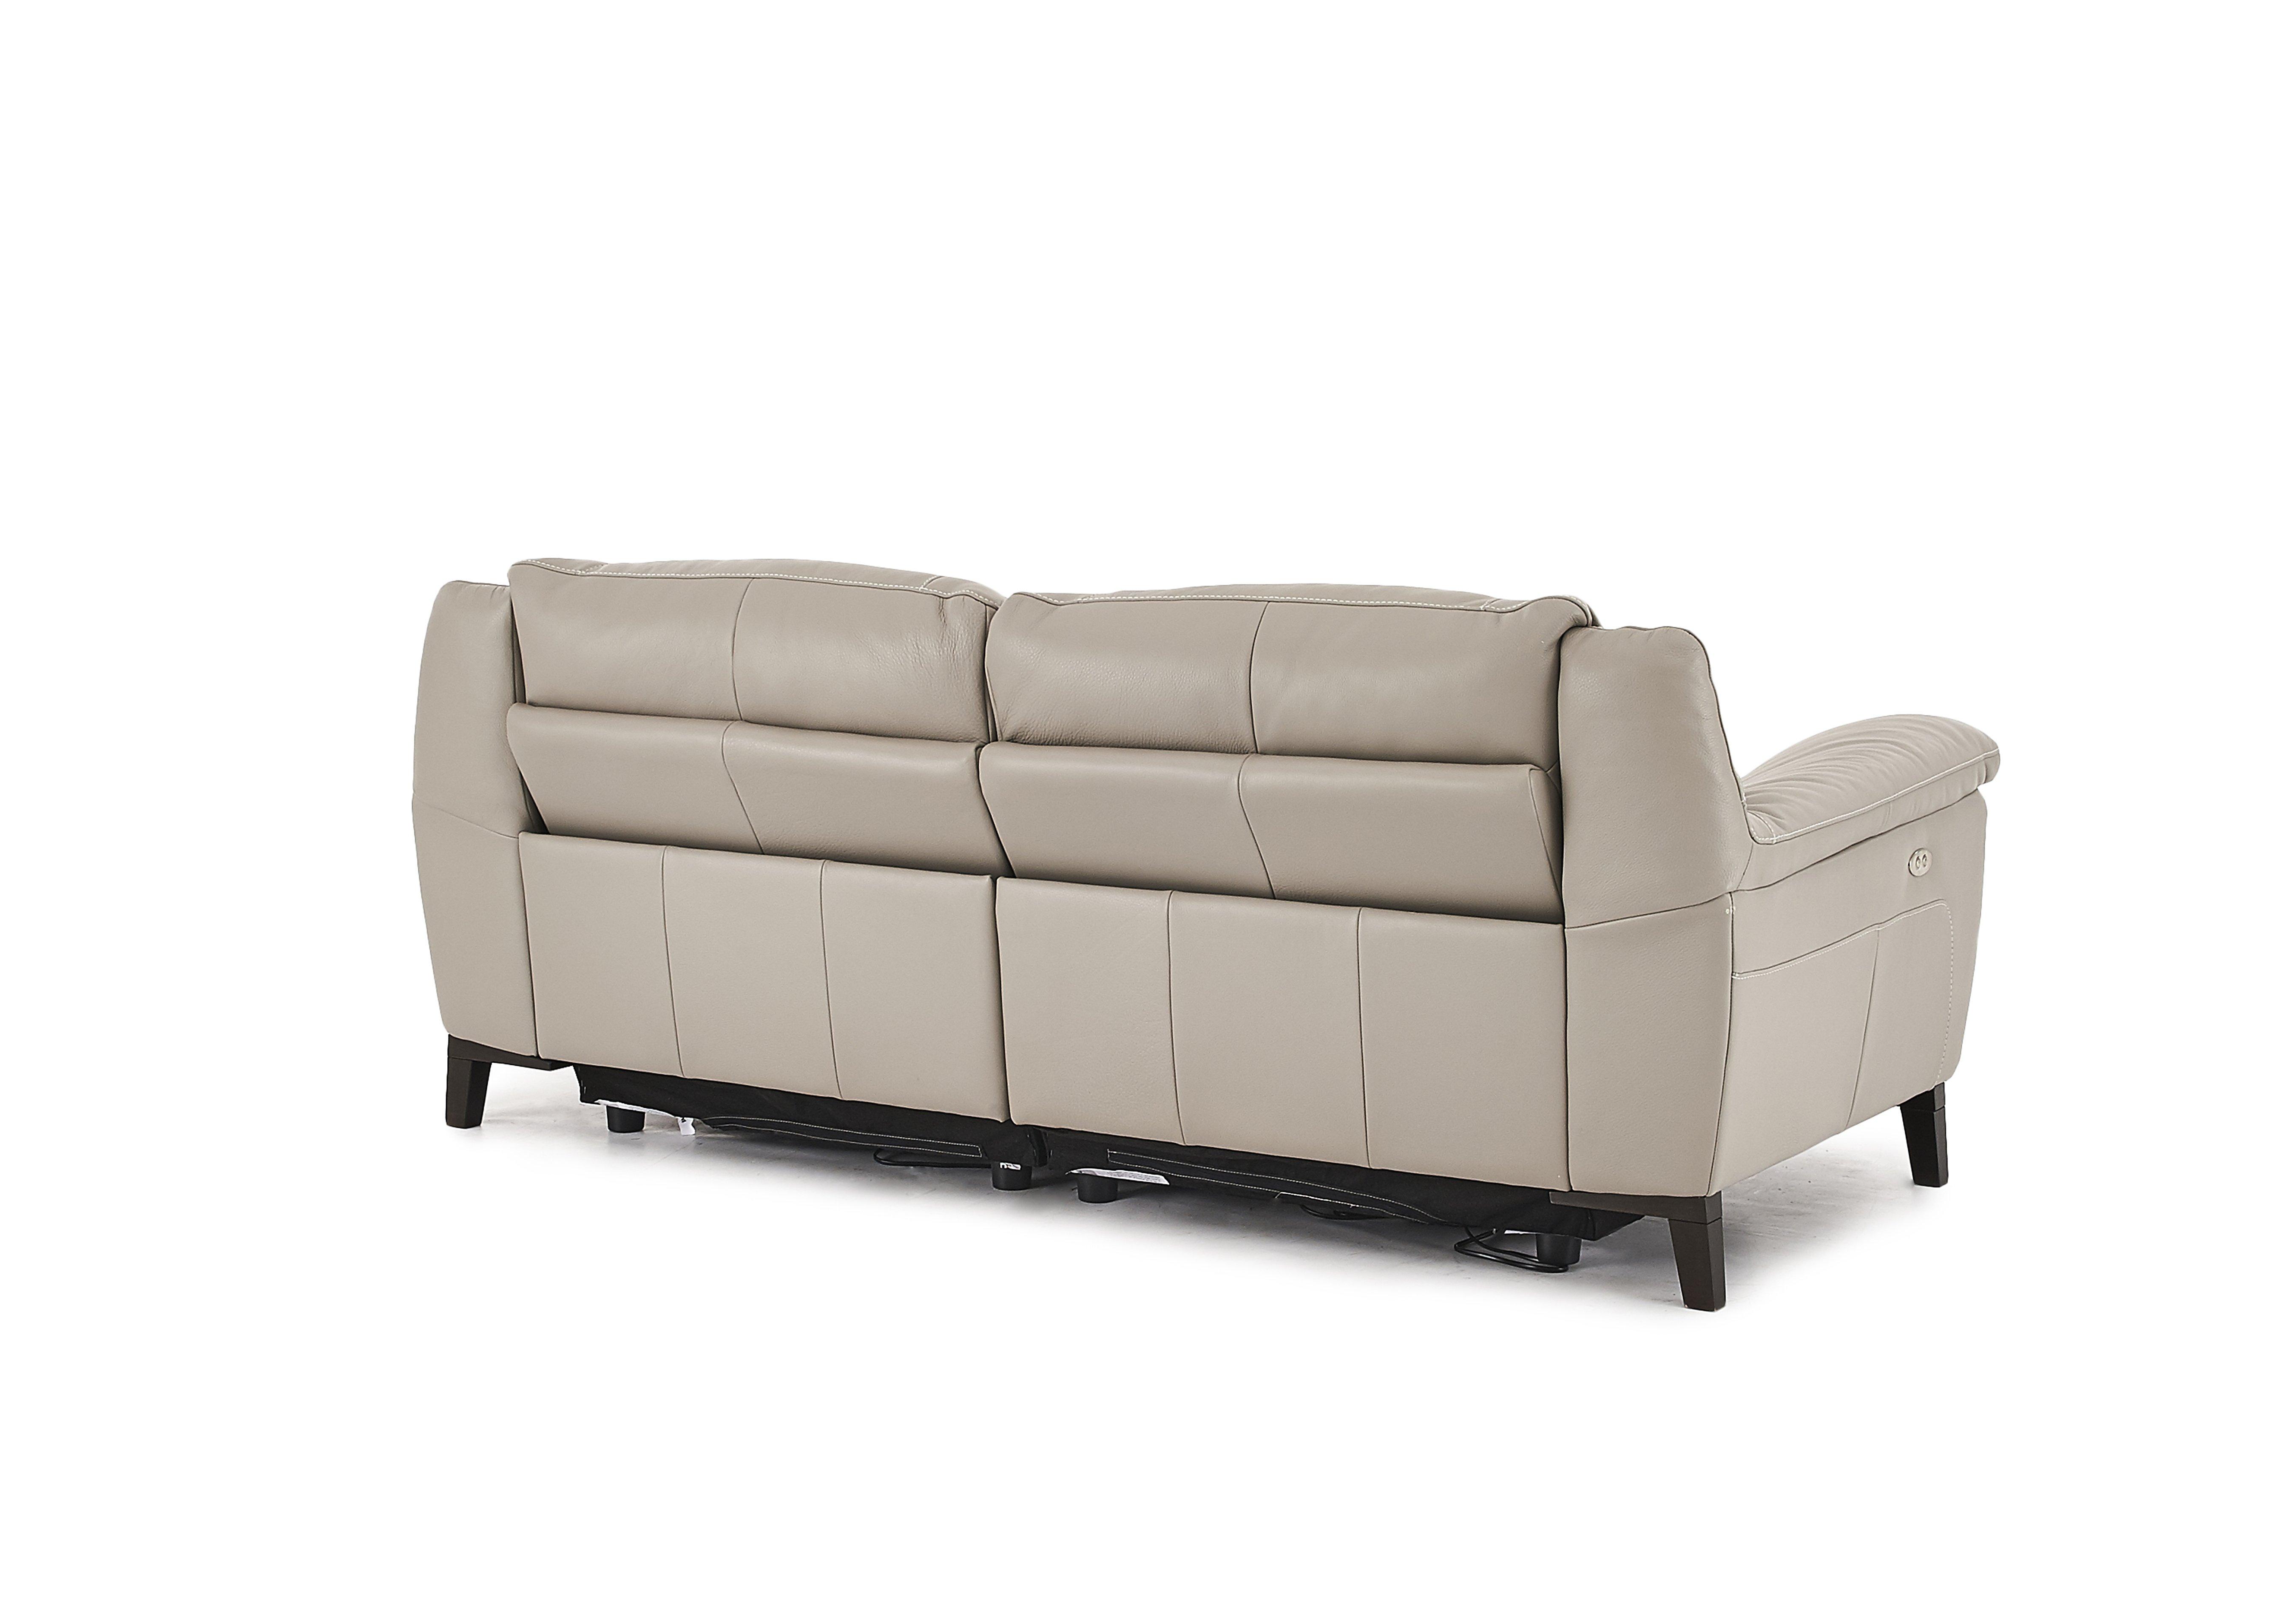 Puglia 2 Seater Leather Recliner Sofa Natuzzi Editions